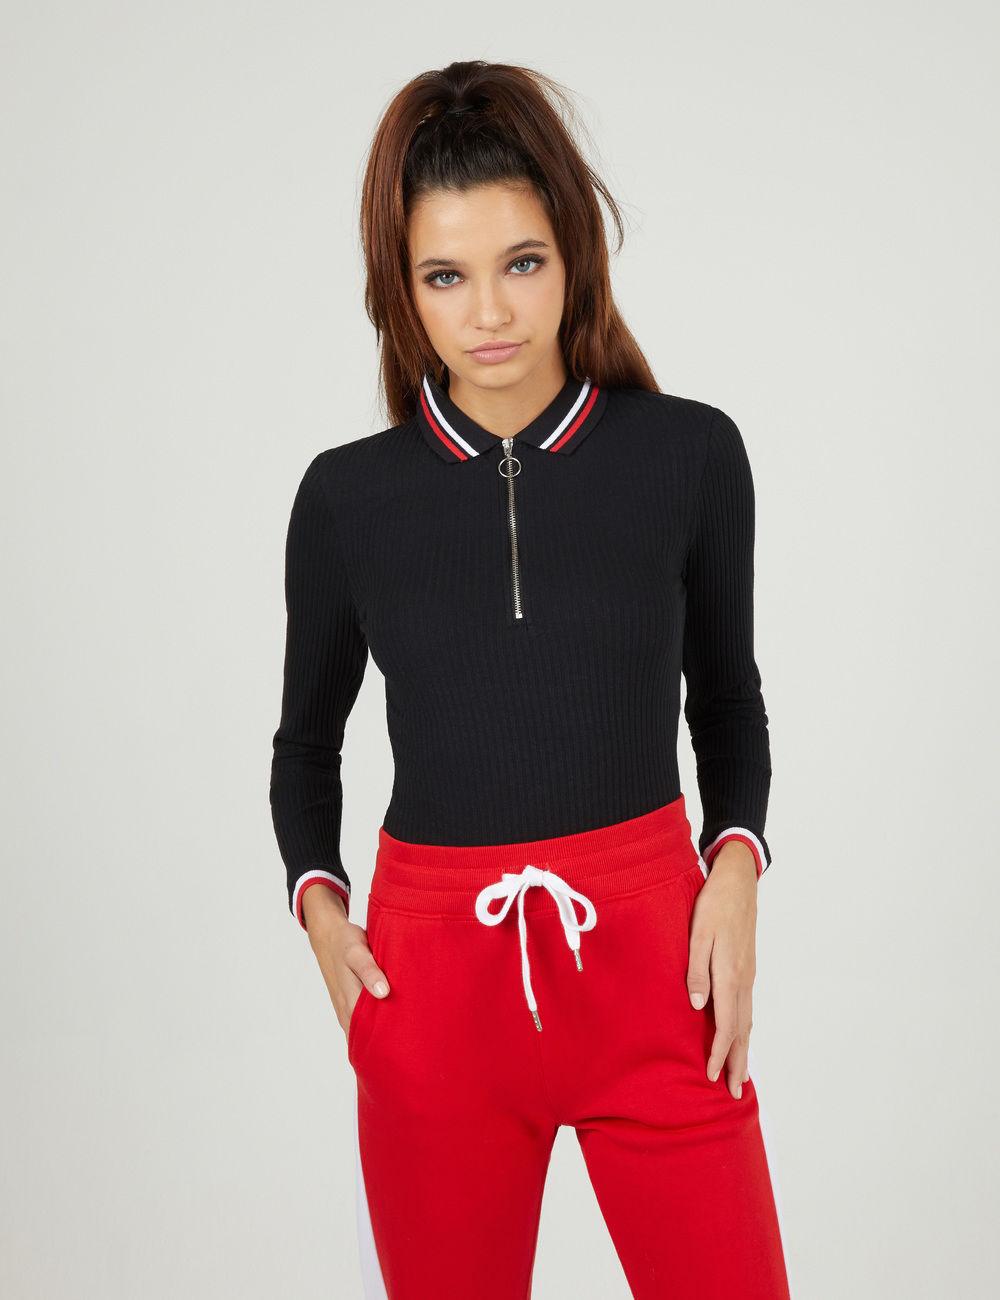 tee-shirt esprit polo noir Jennyfer prix 12,99 €